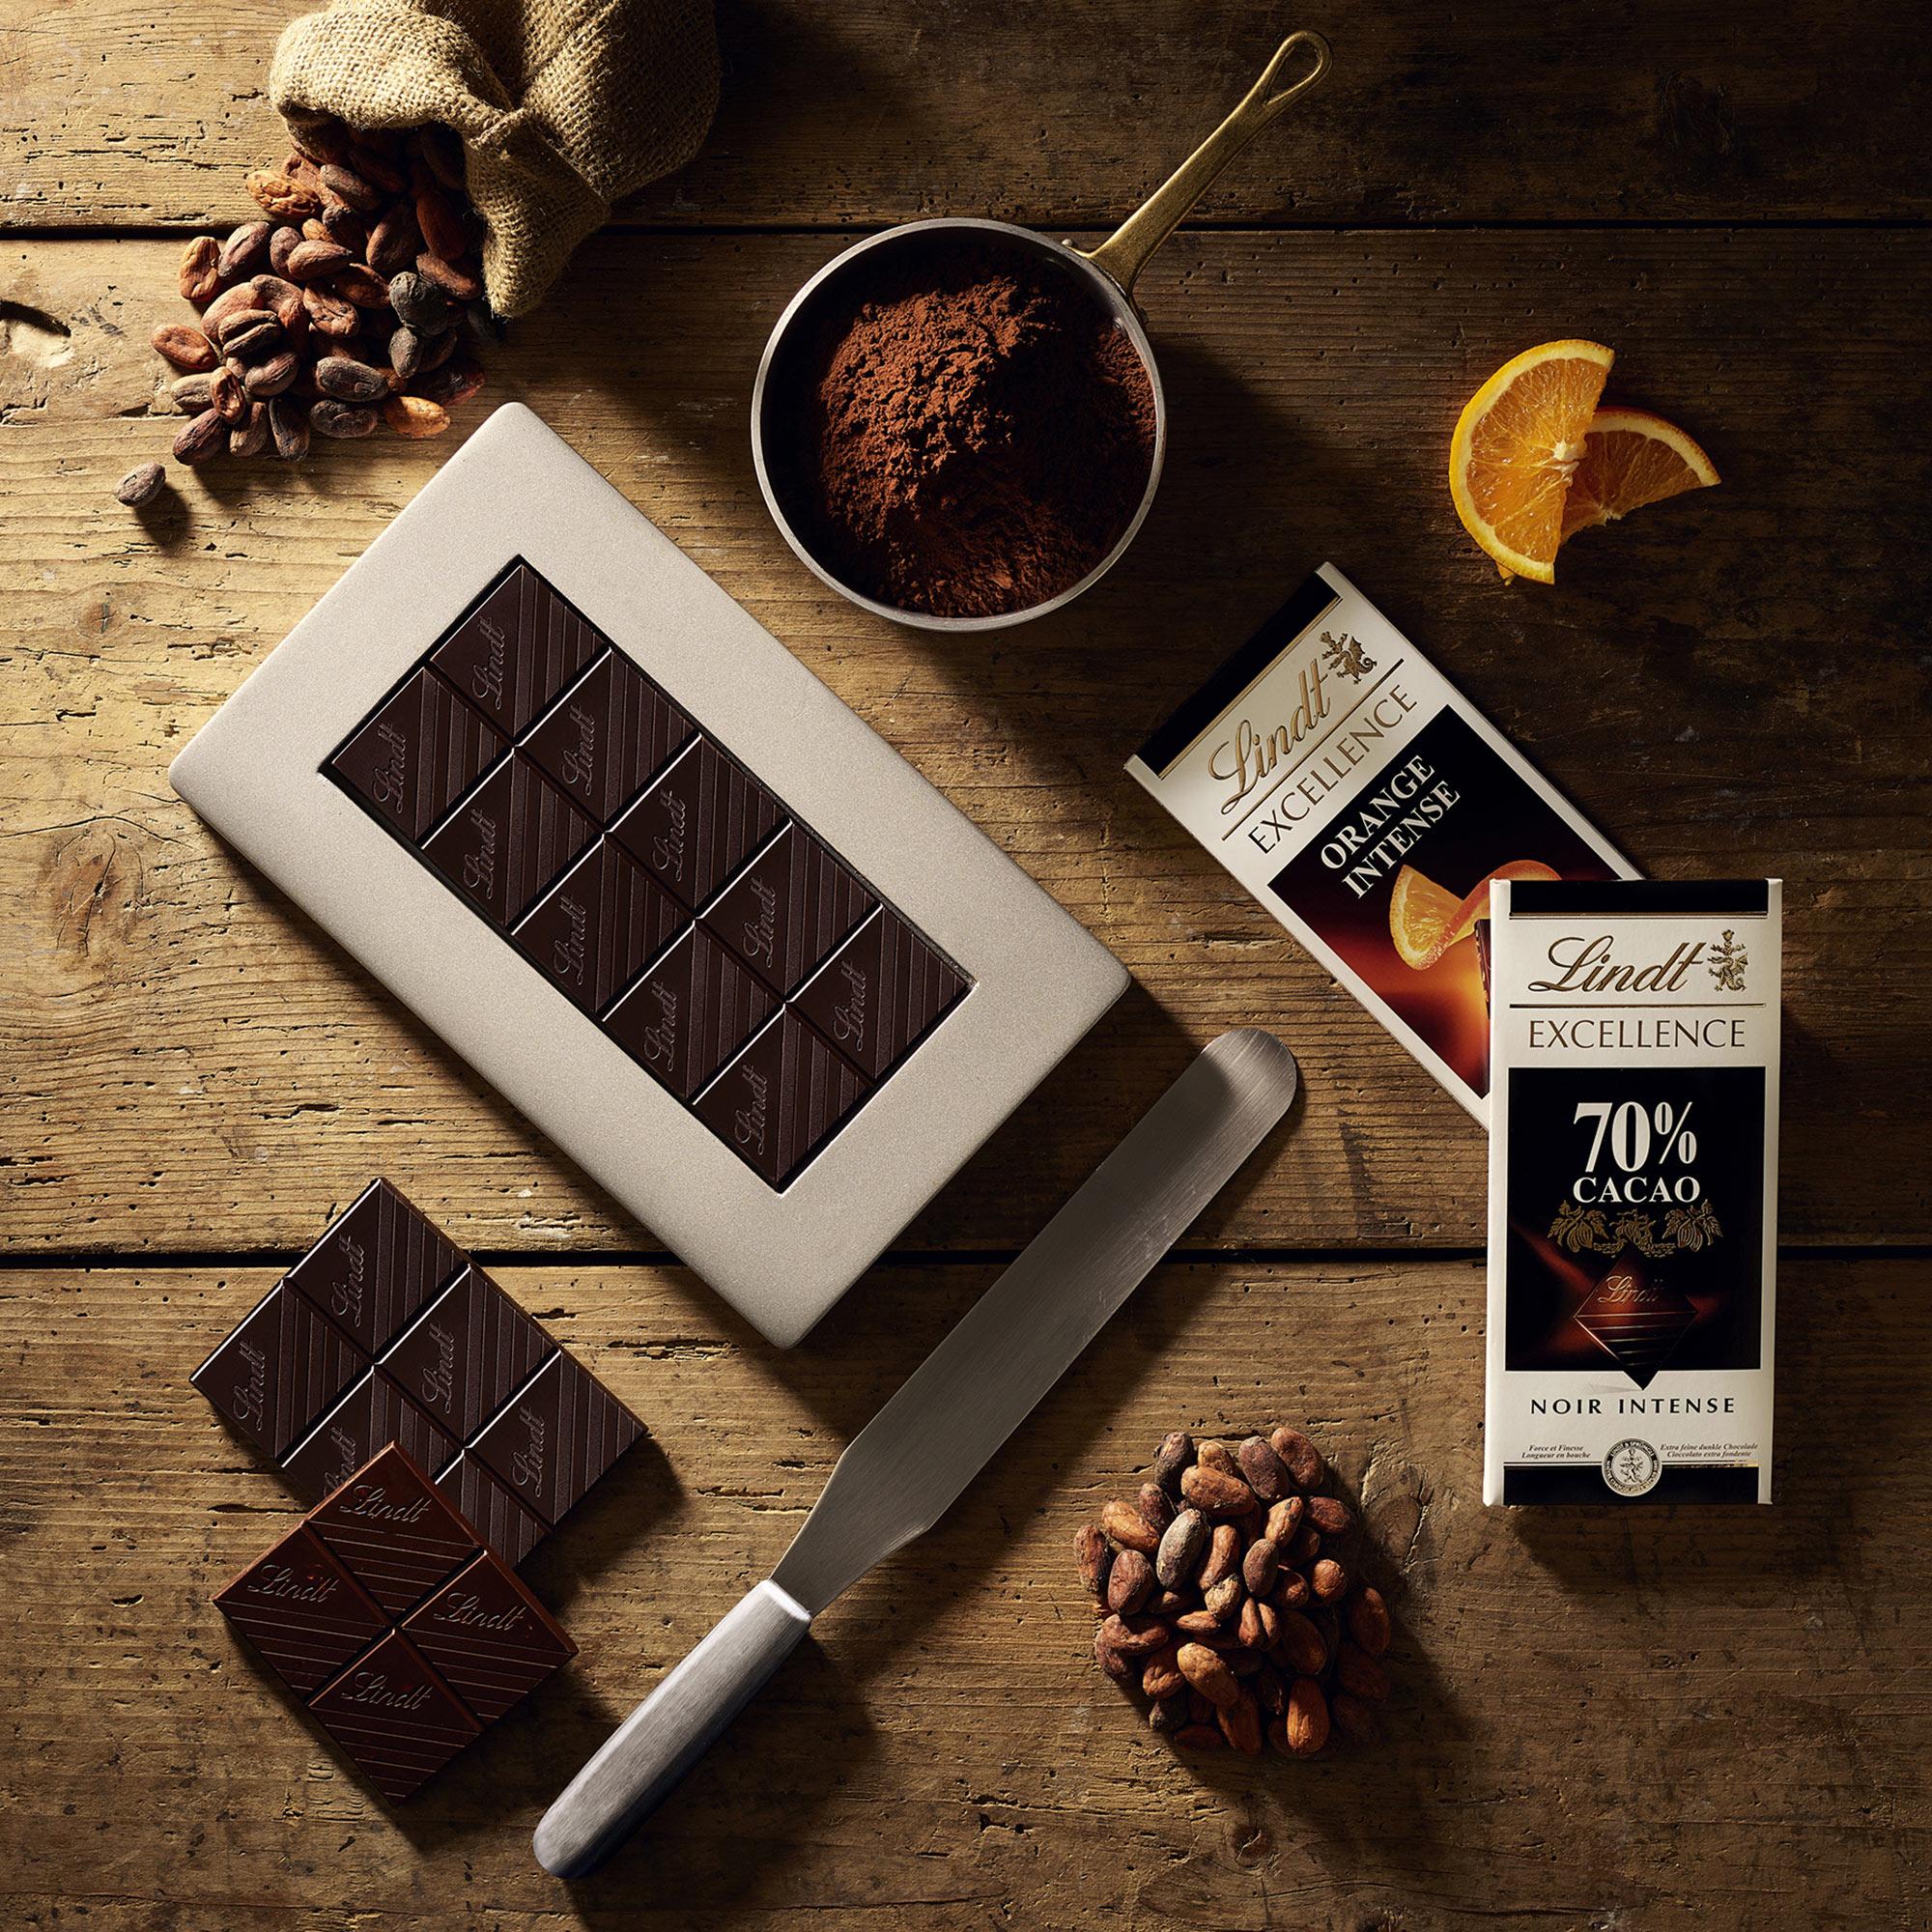 Lindt Cioccolato Tavoletta Fondente Excellence Cacao Arancia